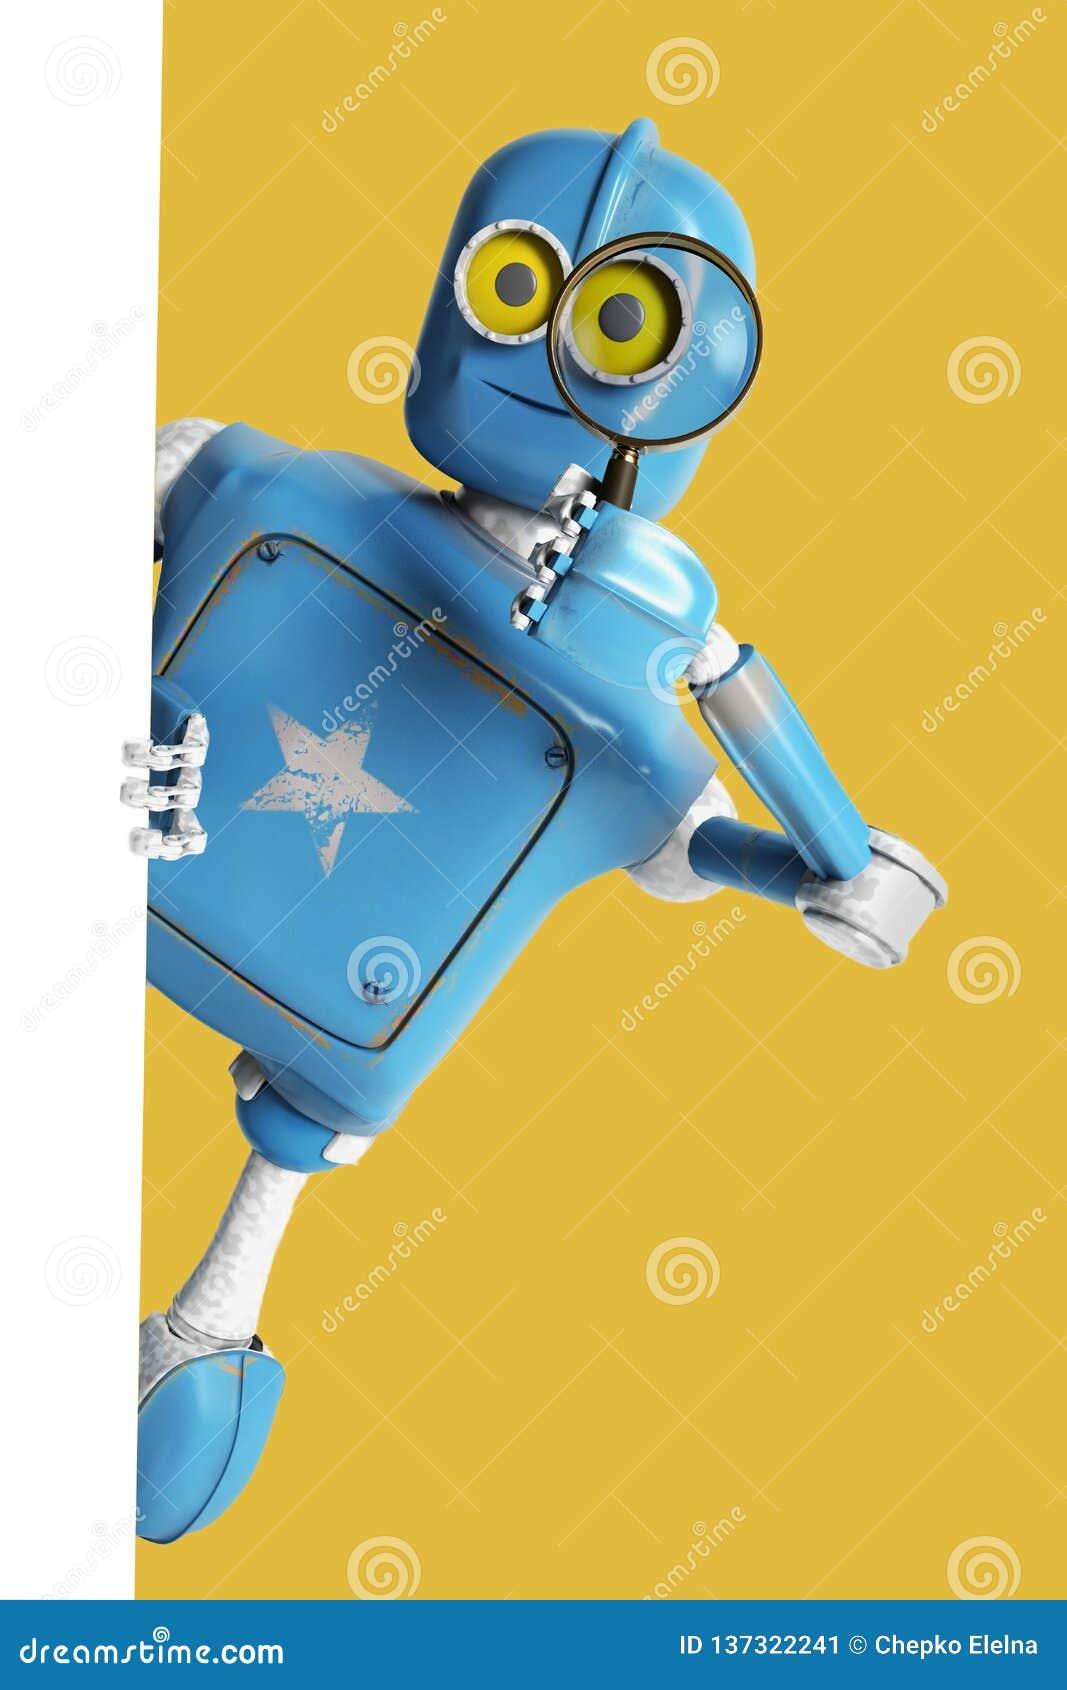 Mirada retra del robot a través de una lupa cyborg del vintage